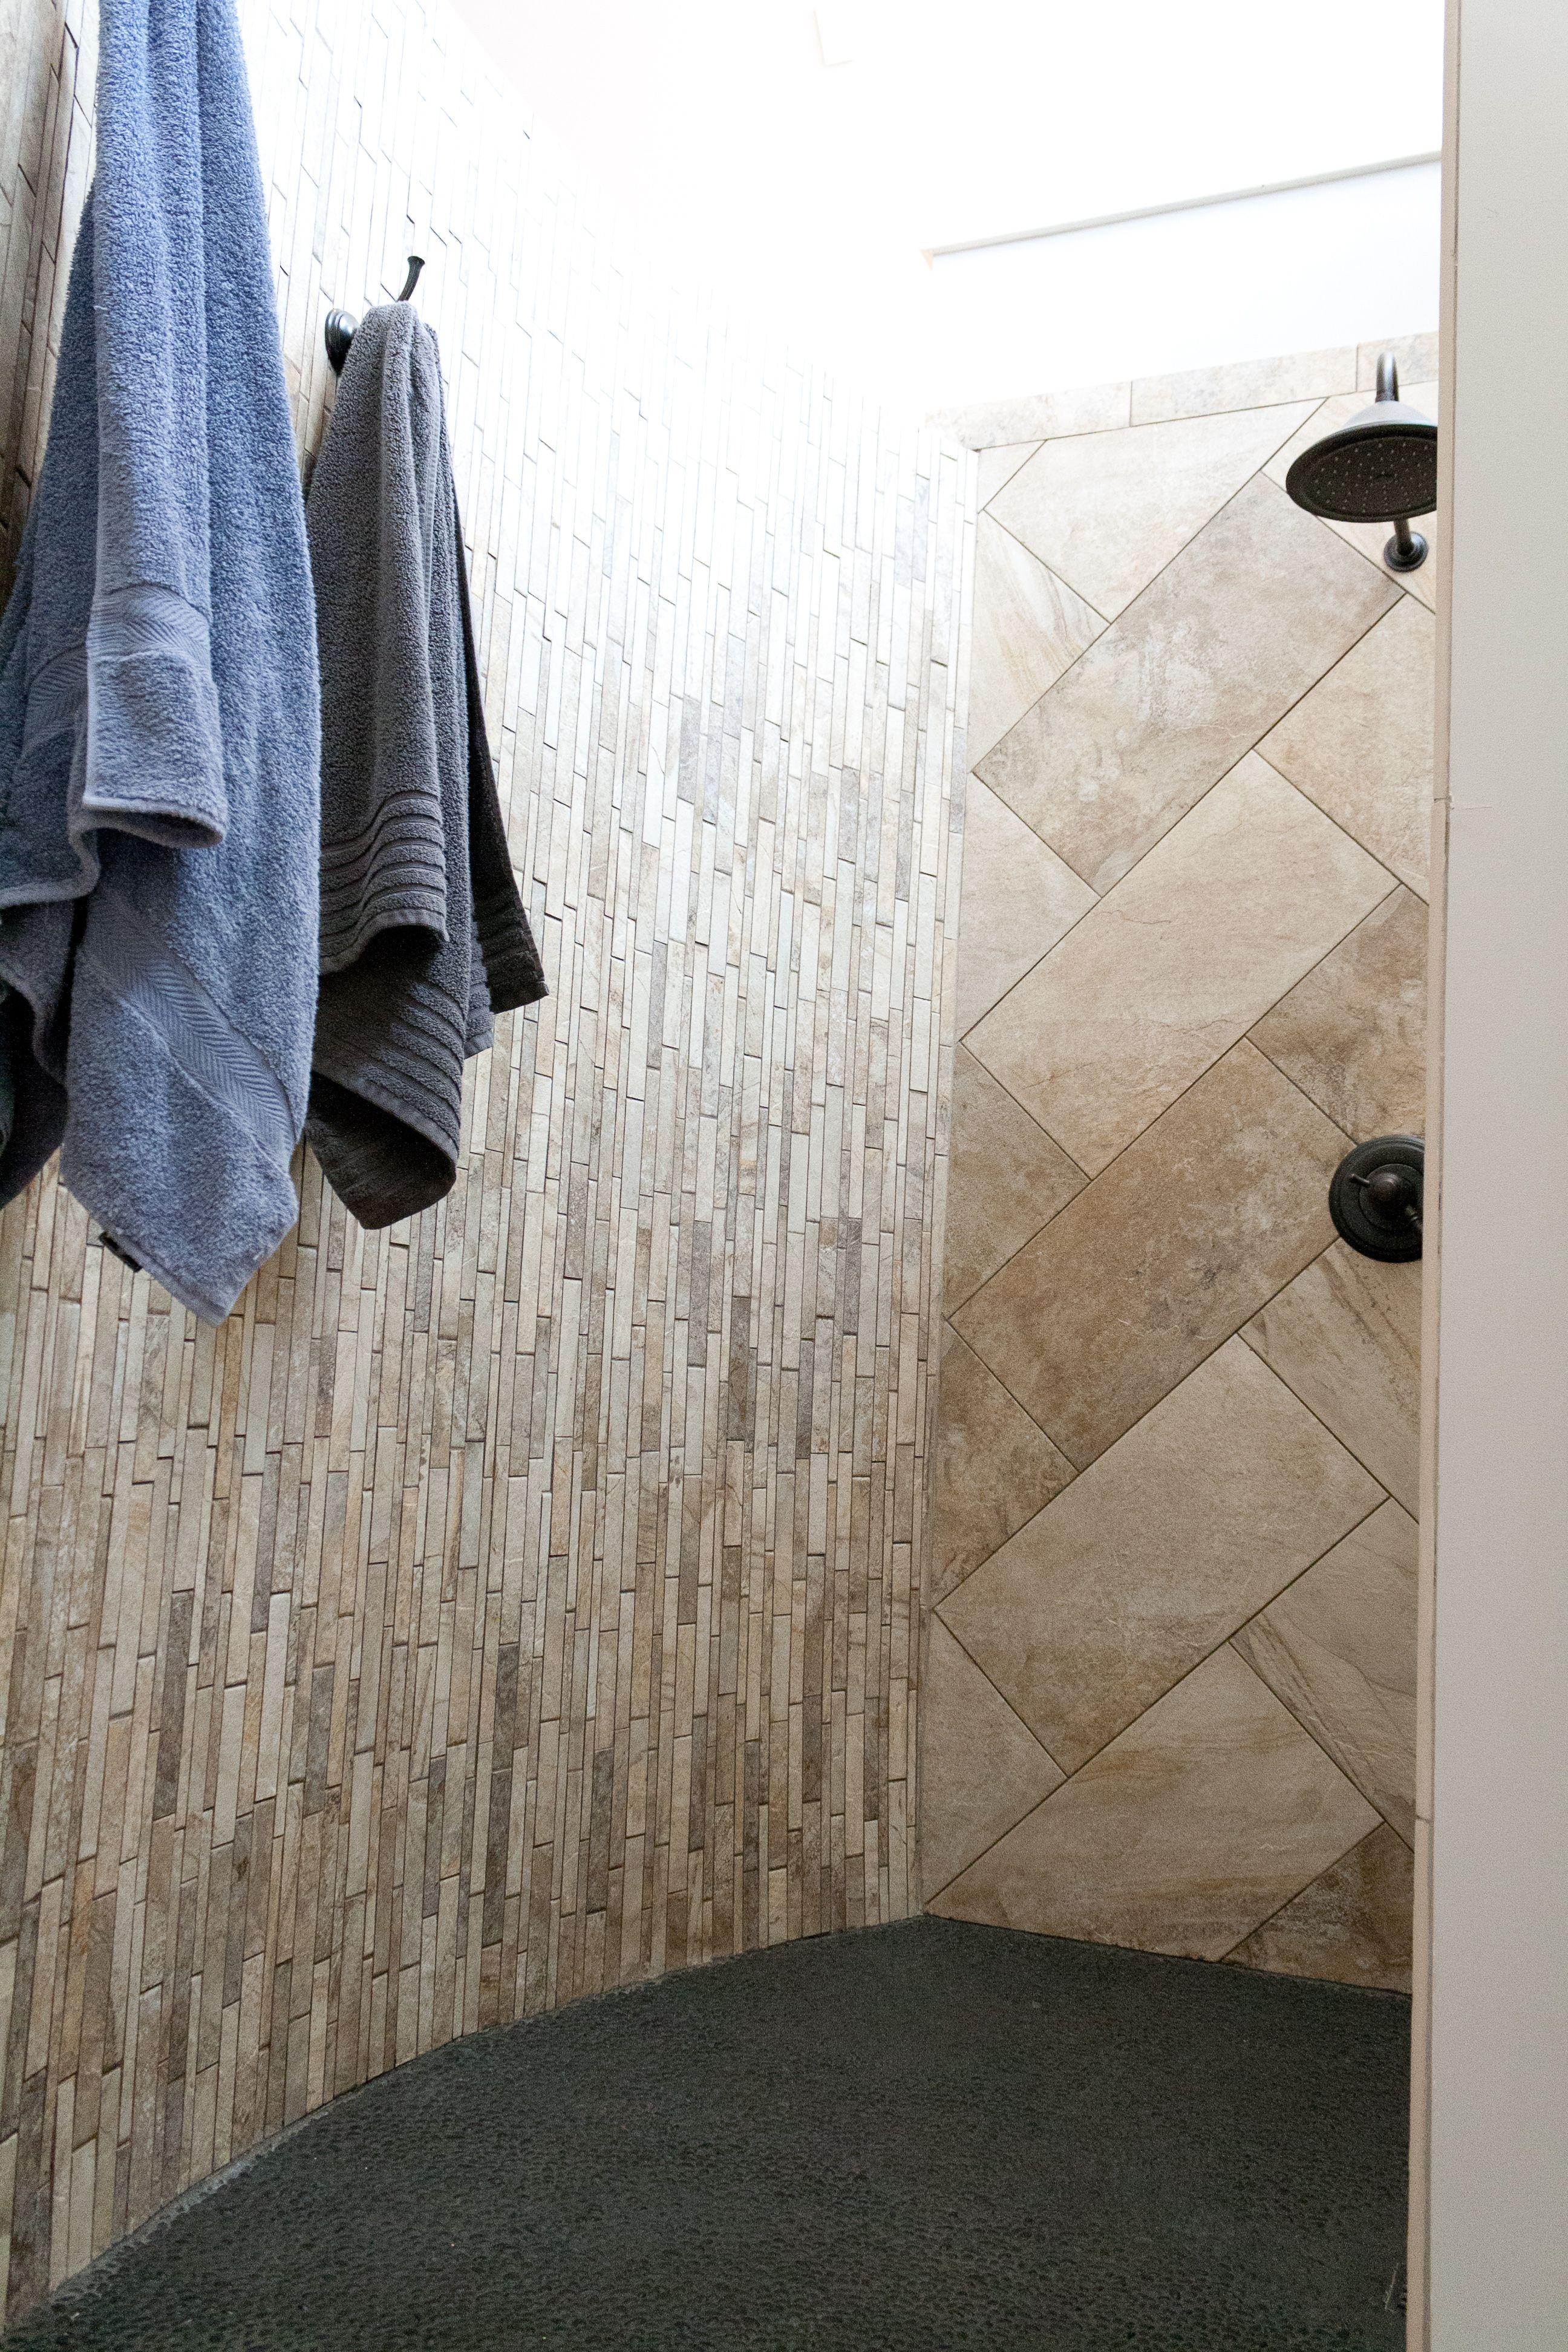 Result Shower Micro Pebble Floor Epoxy Grout Porcelain Tile Pebble Floor Porcelain Tile Epoxy Grout